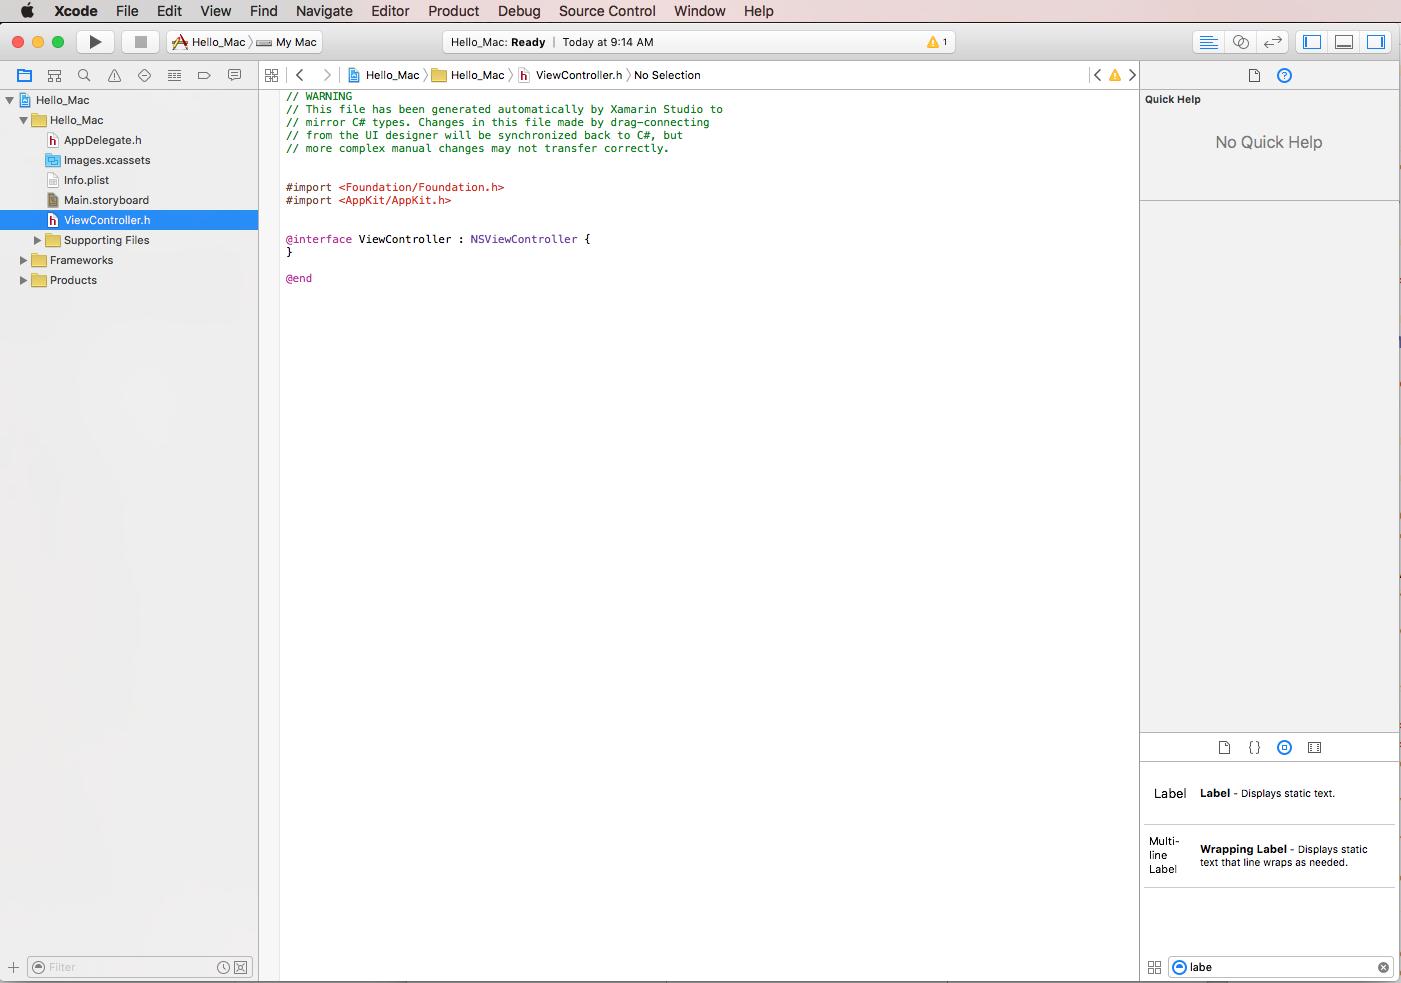 microsoft word is not responding on mac